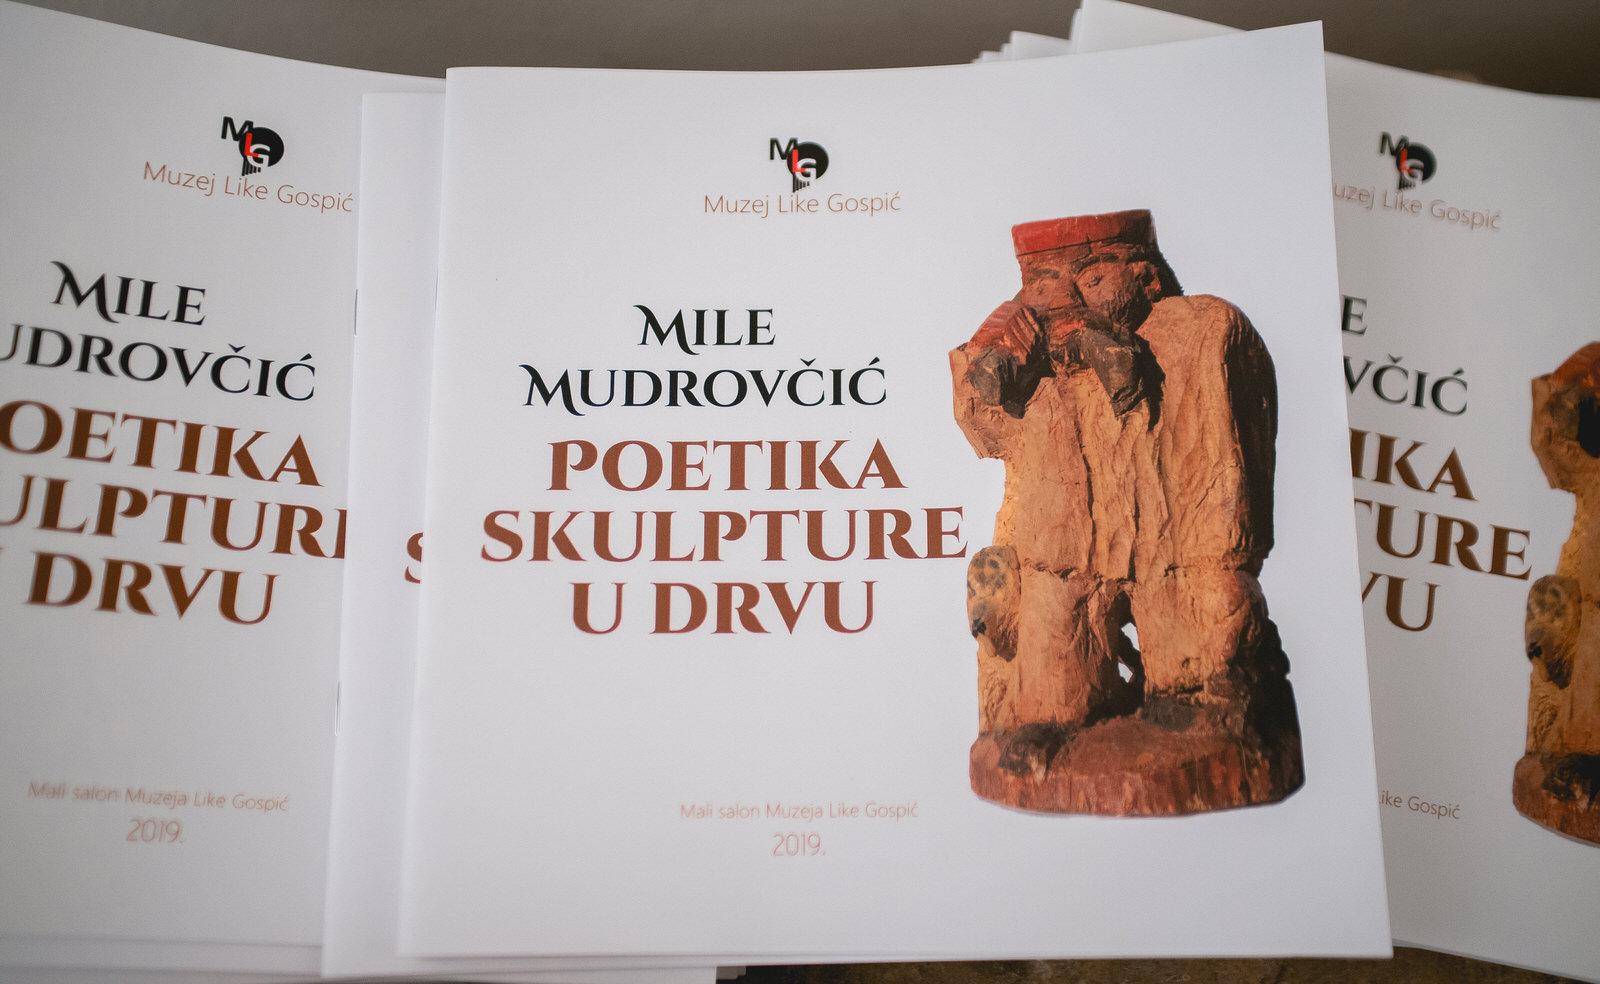 likaclub_gospić_izložba-poetika-skulpture-u-drvu_2019-11